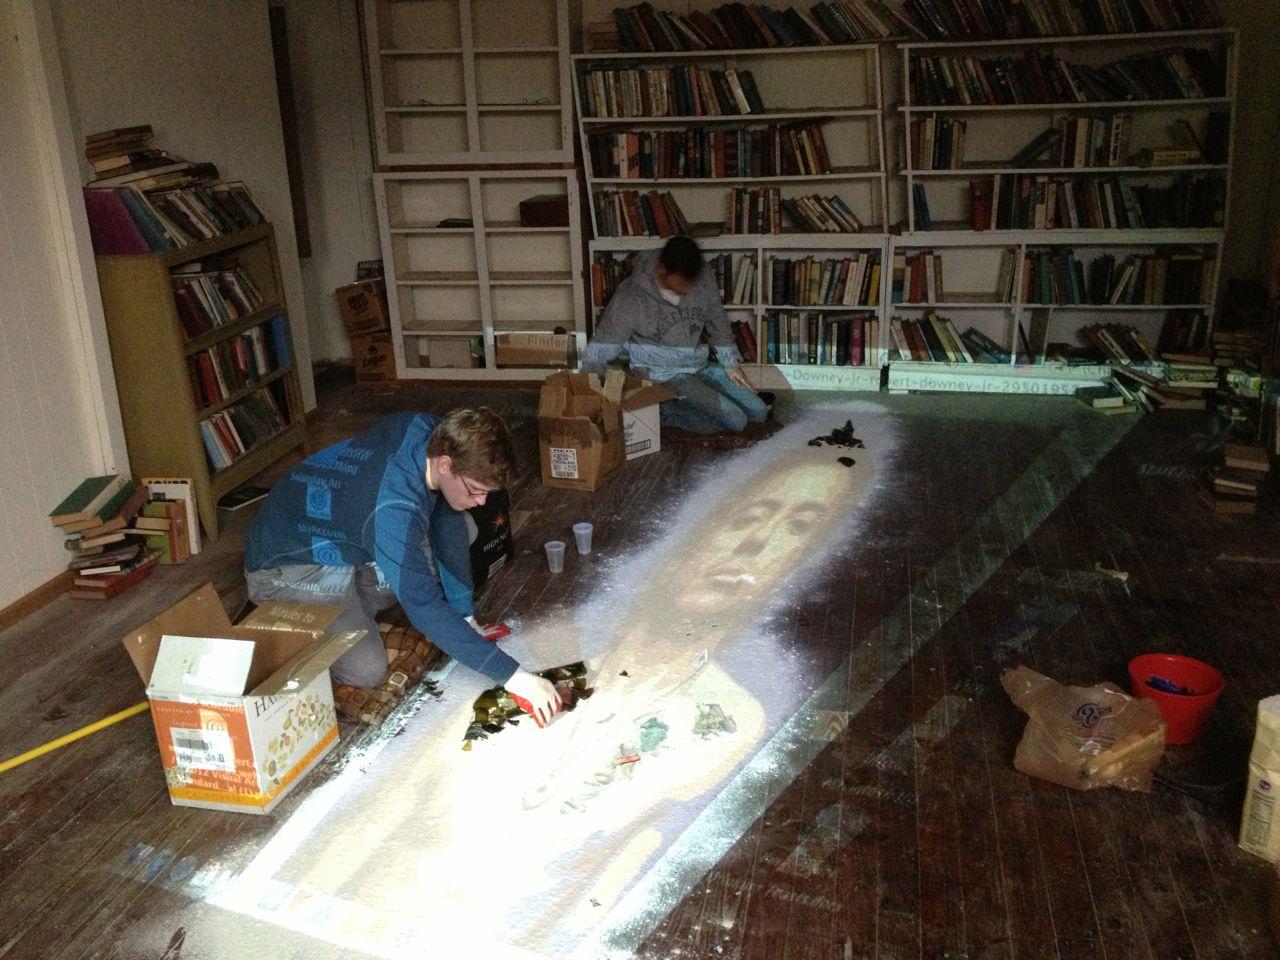 Sam Engel and Joseph Harris working on their installation